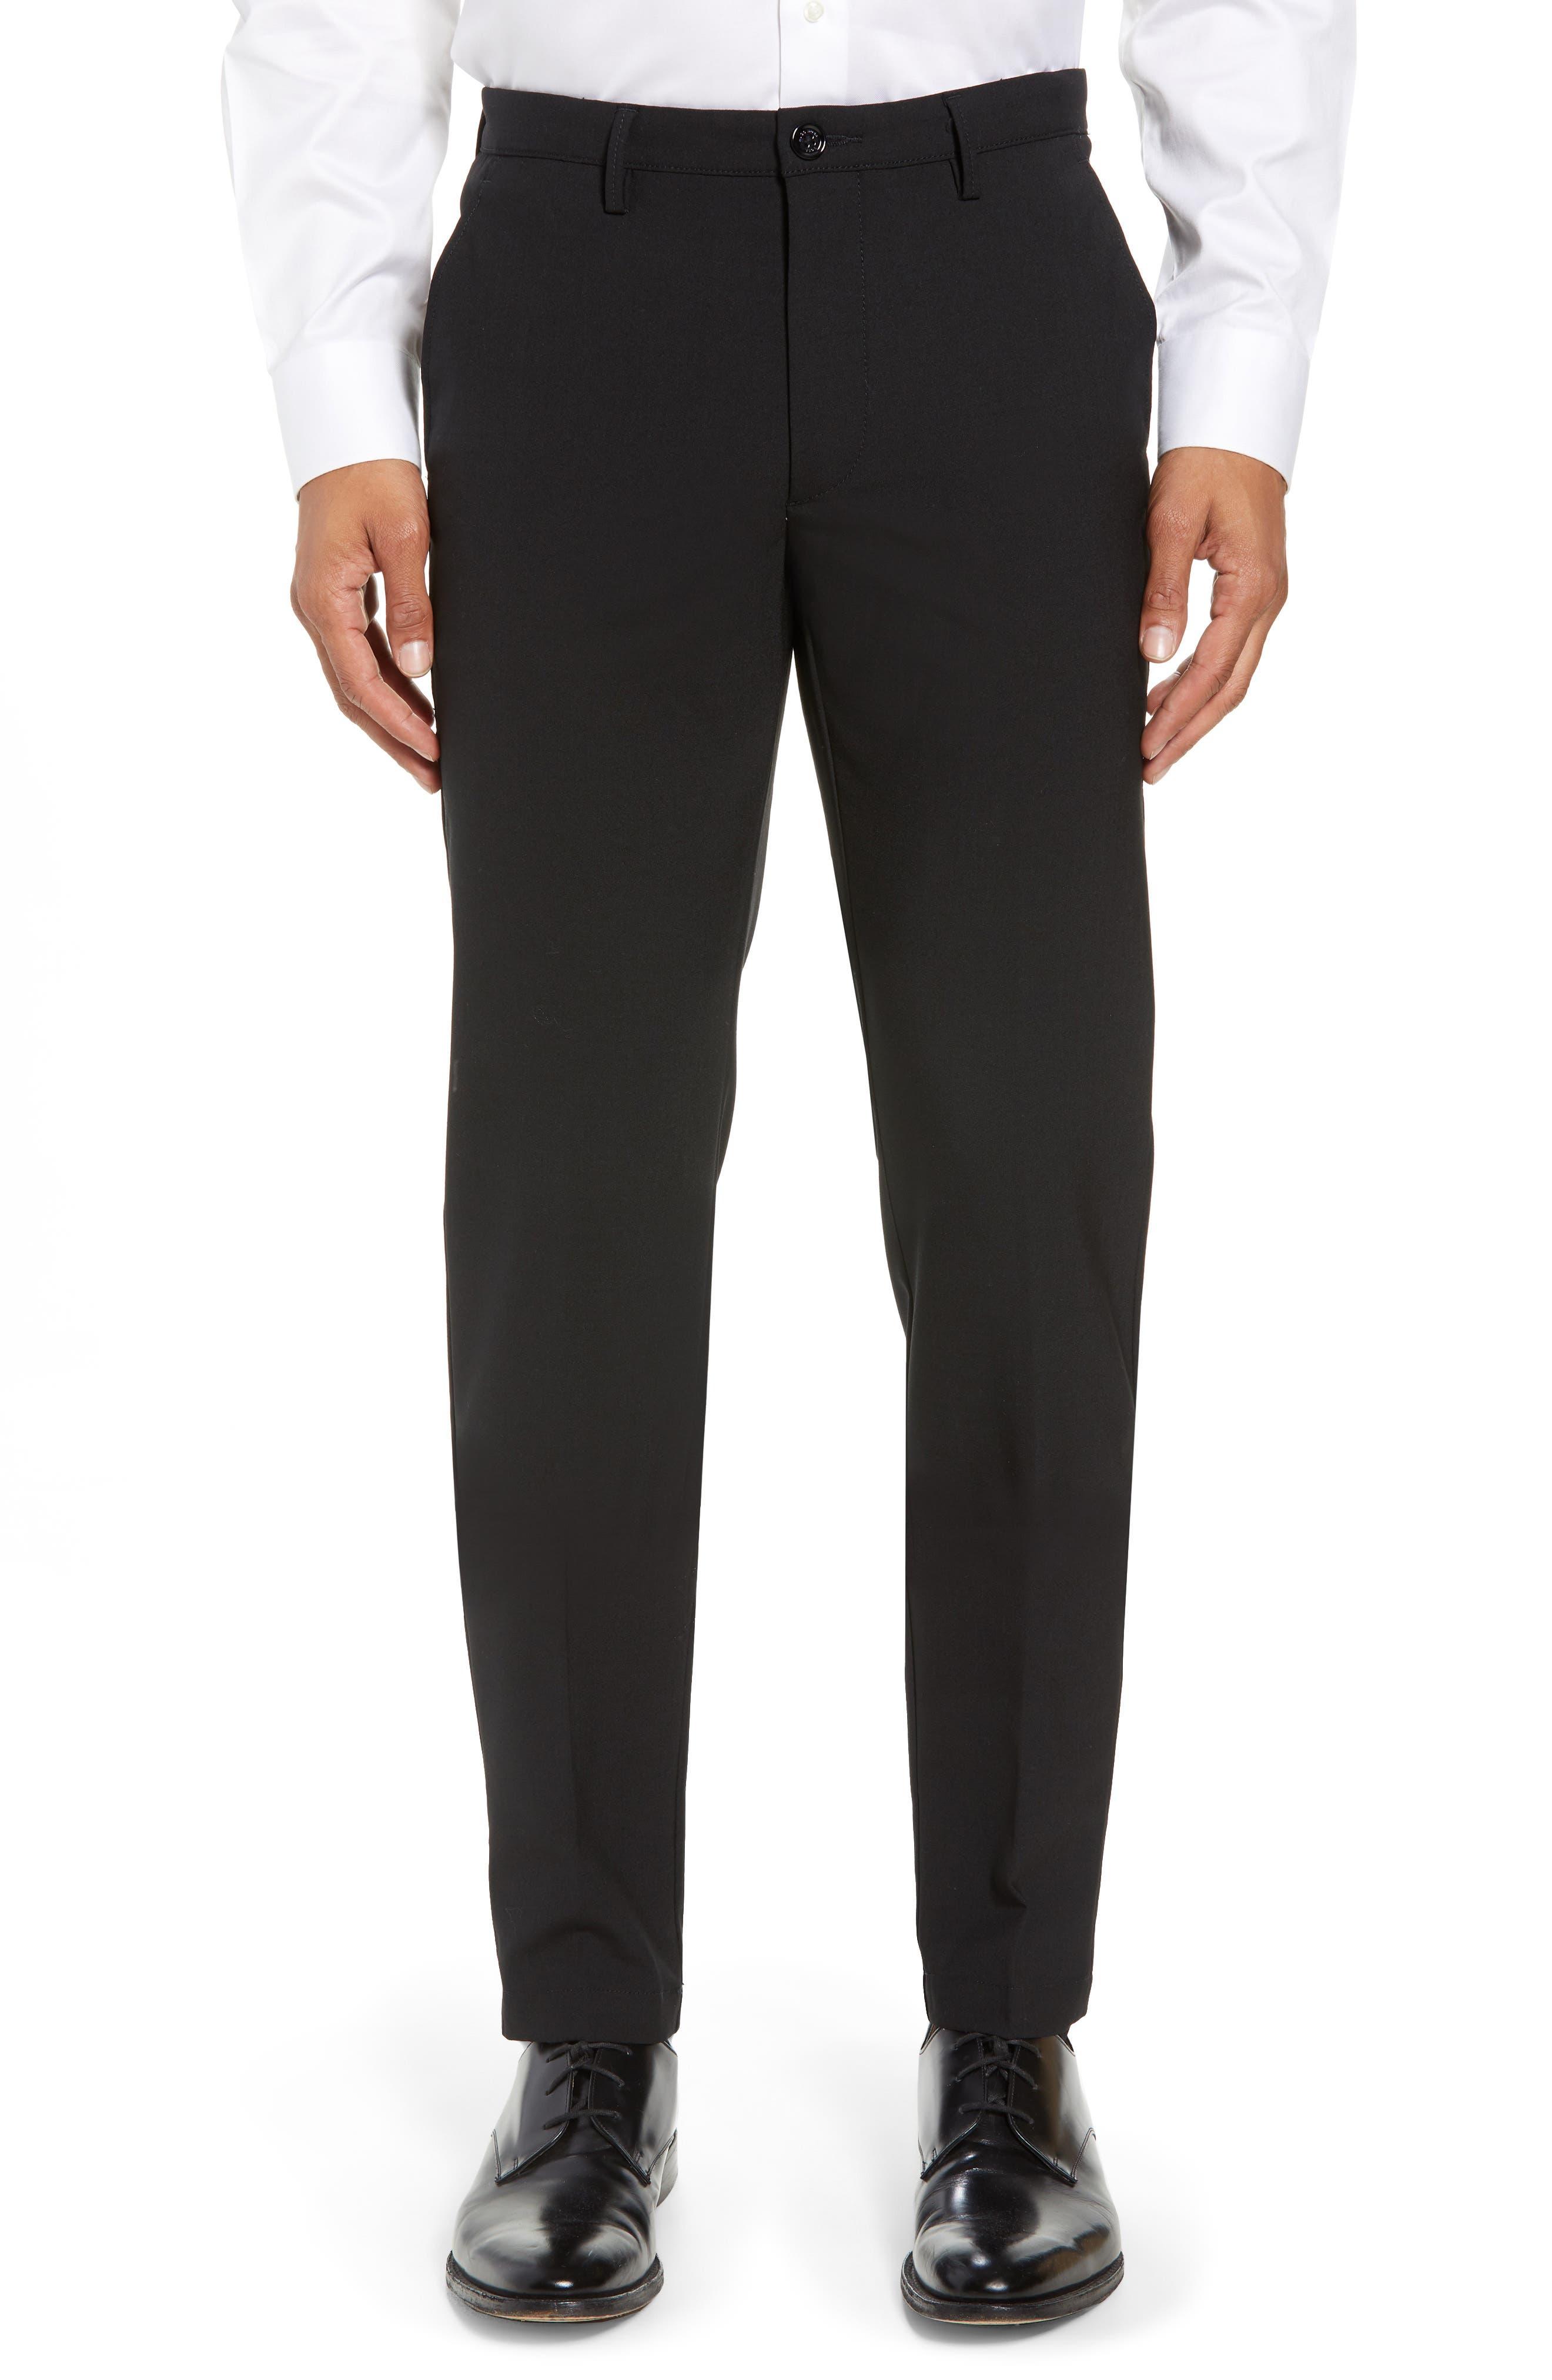 Kaito Slim Fit Trousers,                             Main thumbnail 1, color,                             Black